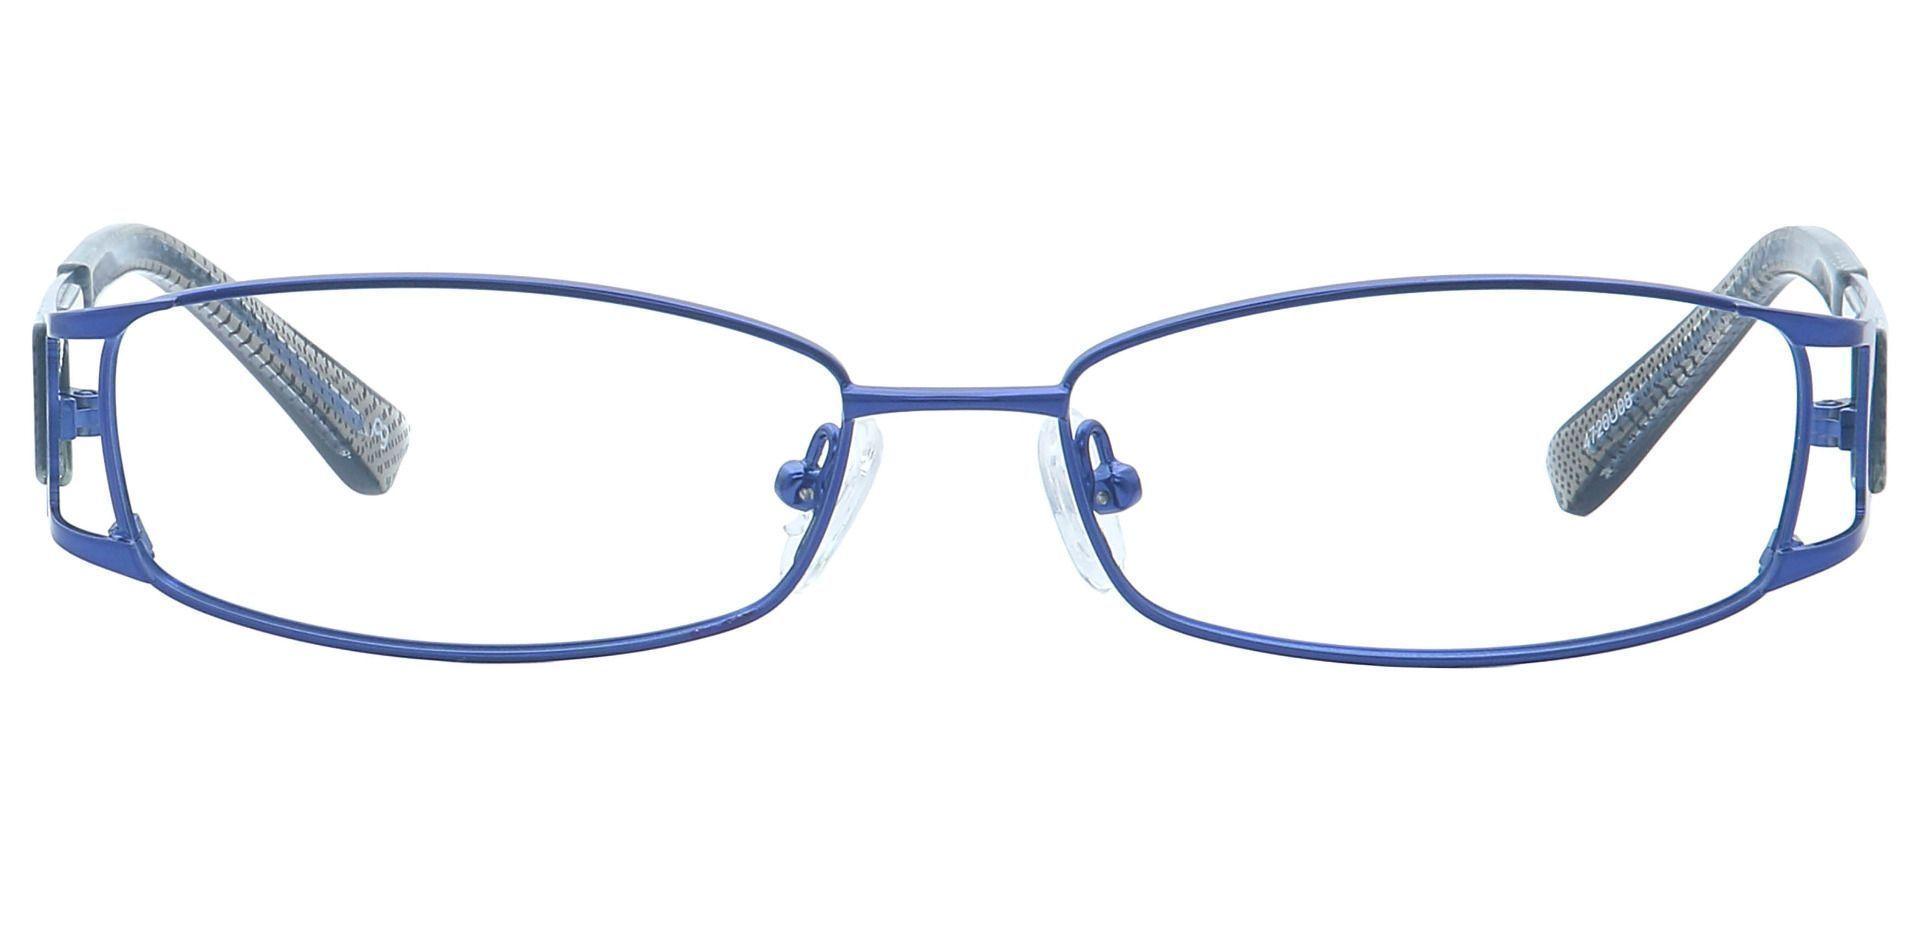 Cami Oval Eyeglasses Frame - Blue